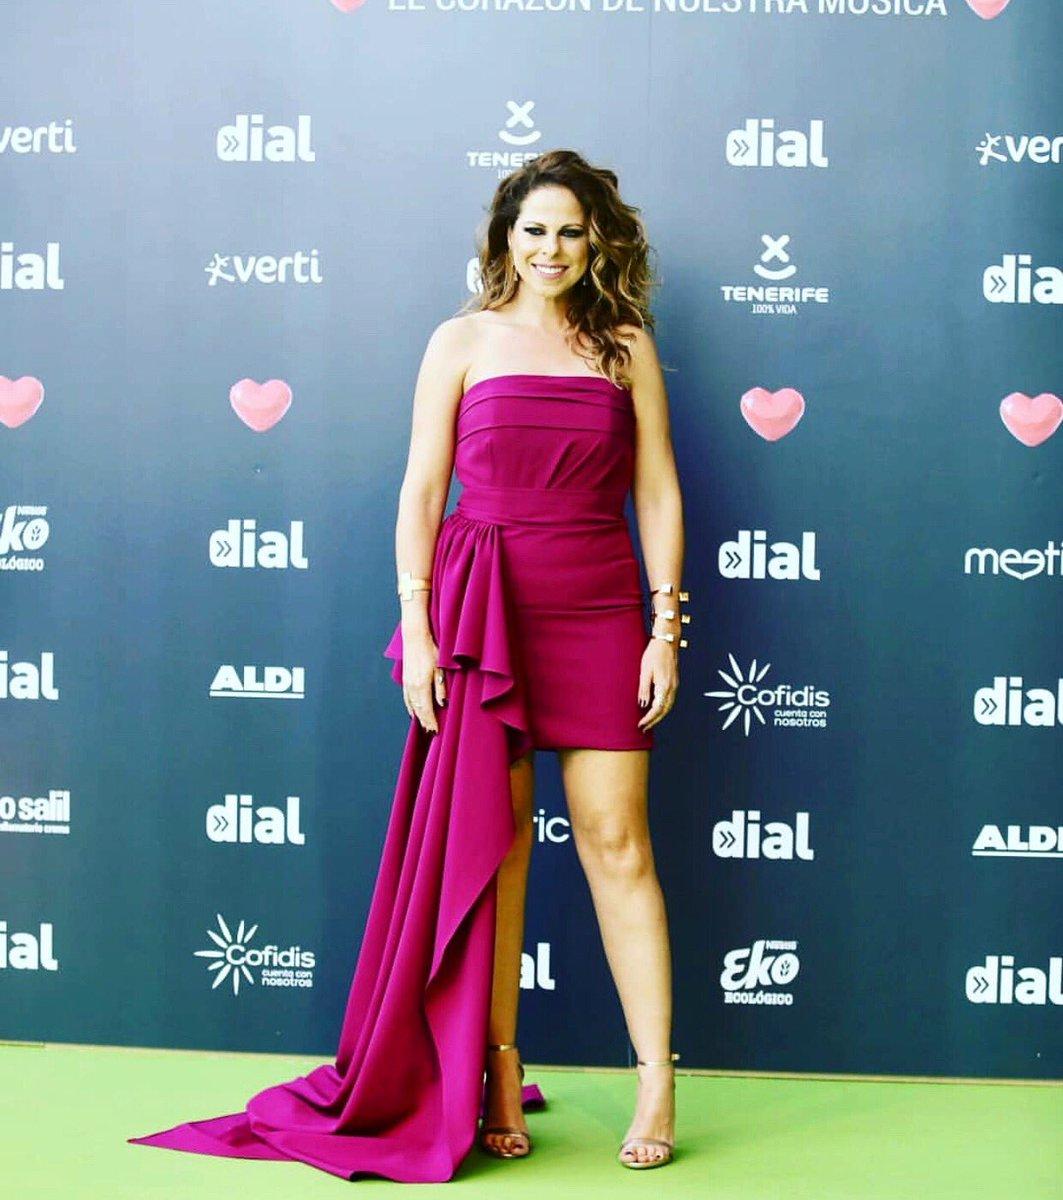 Pastora Soler's photo on #PremiosDial